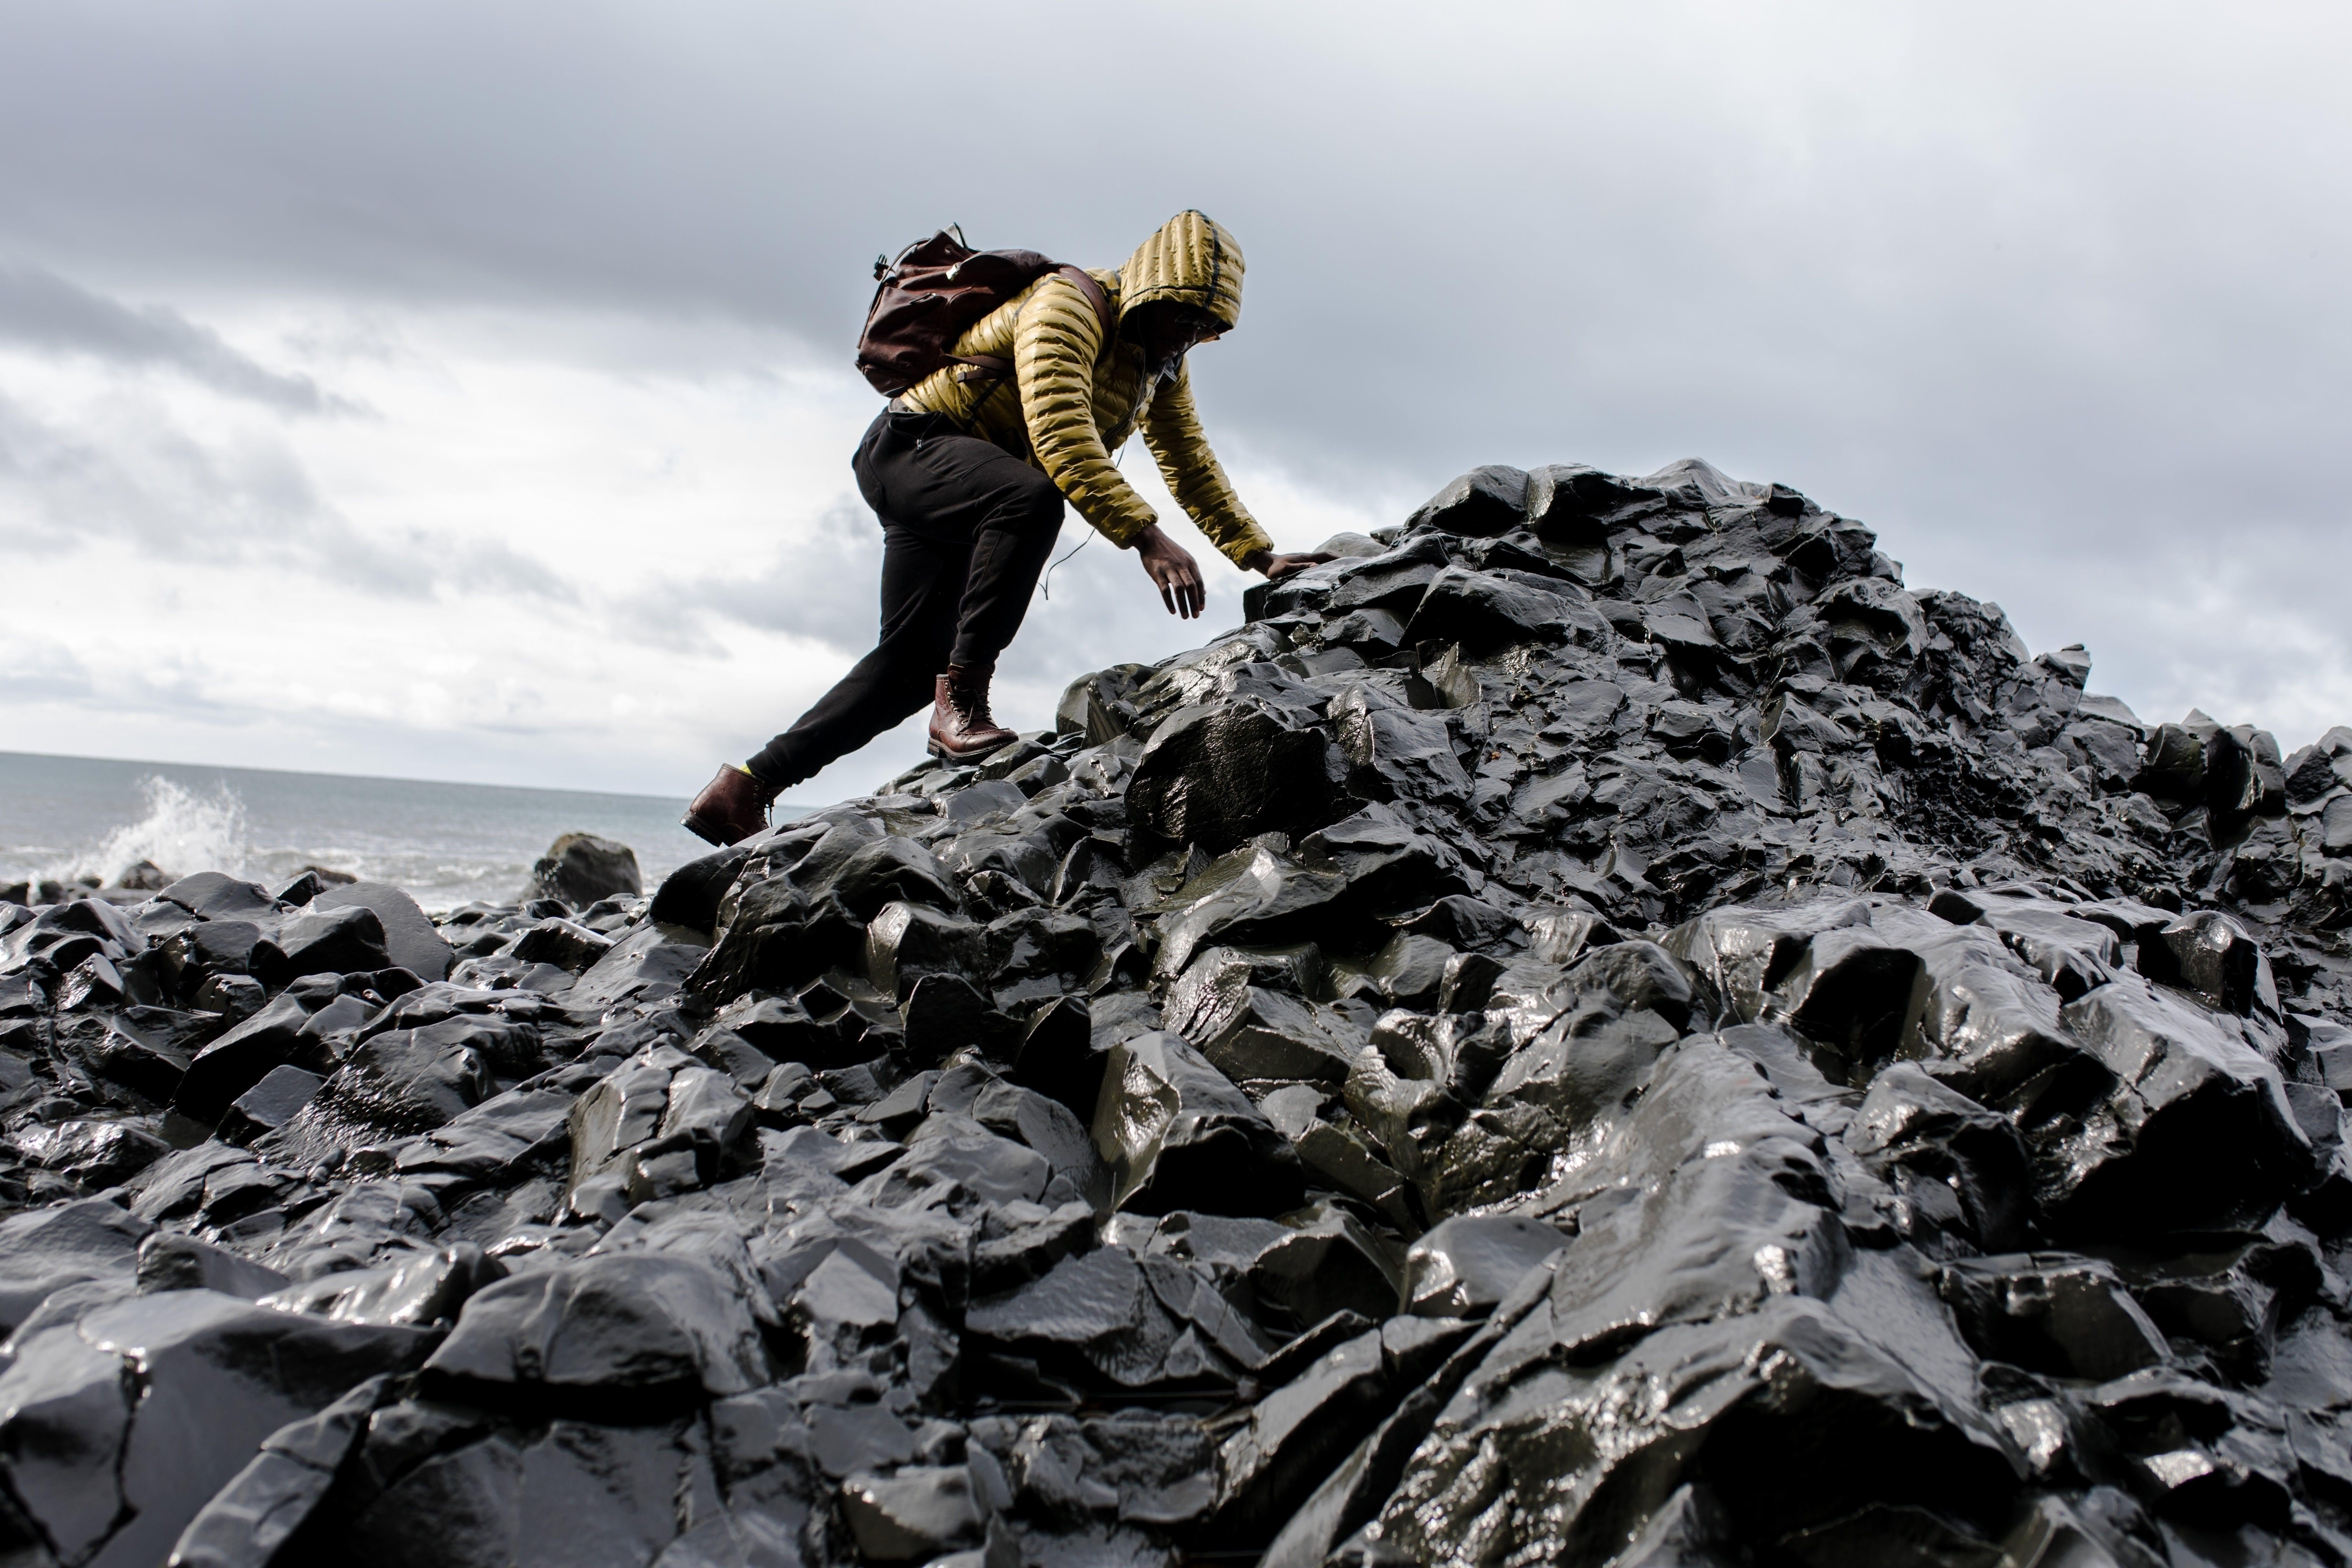 Man Wearing Hoodie and Black Pants Climbing Up Pile of Rocks